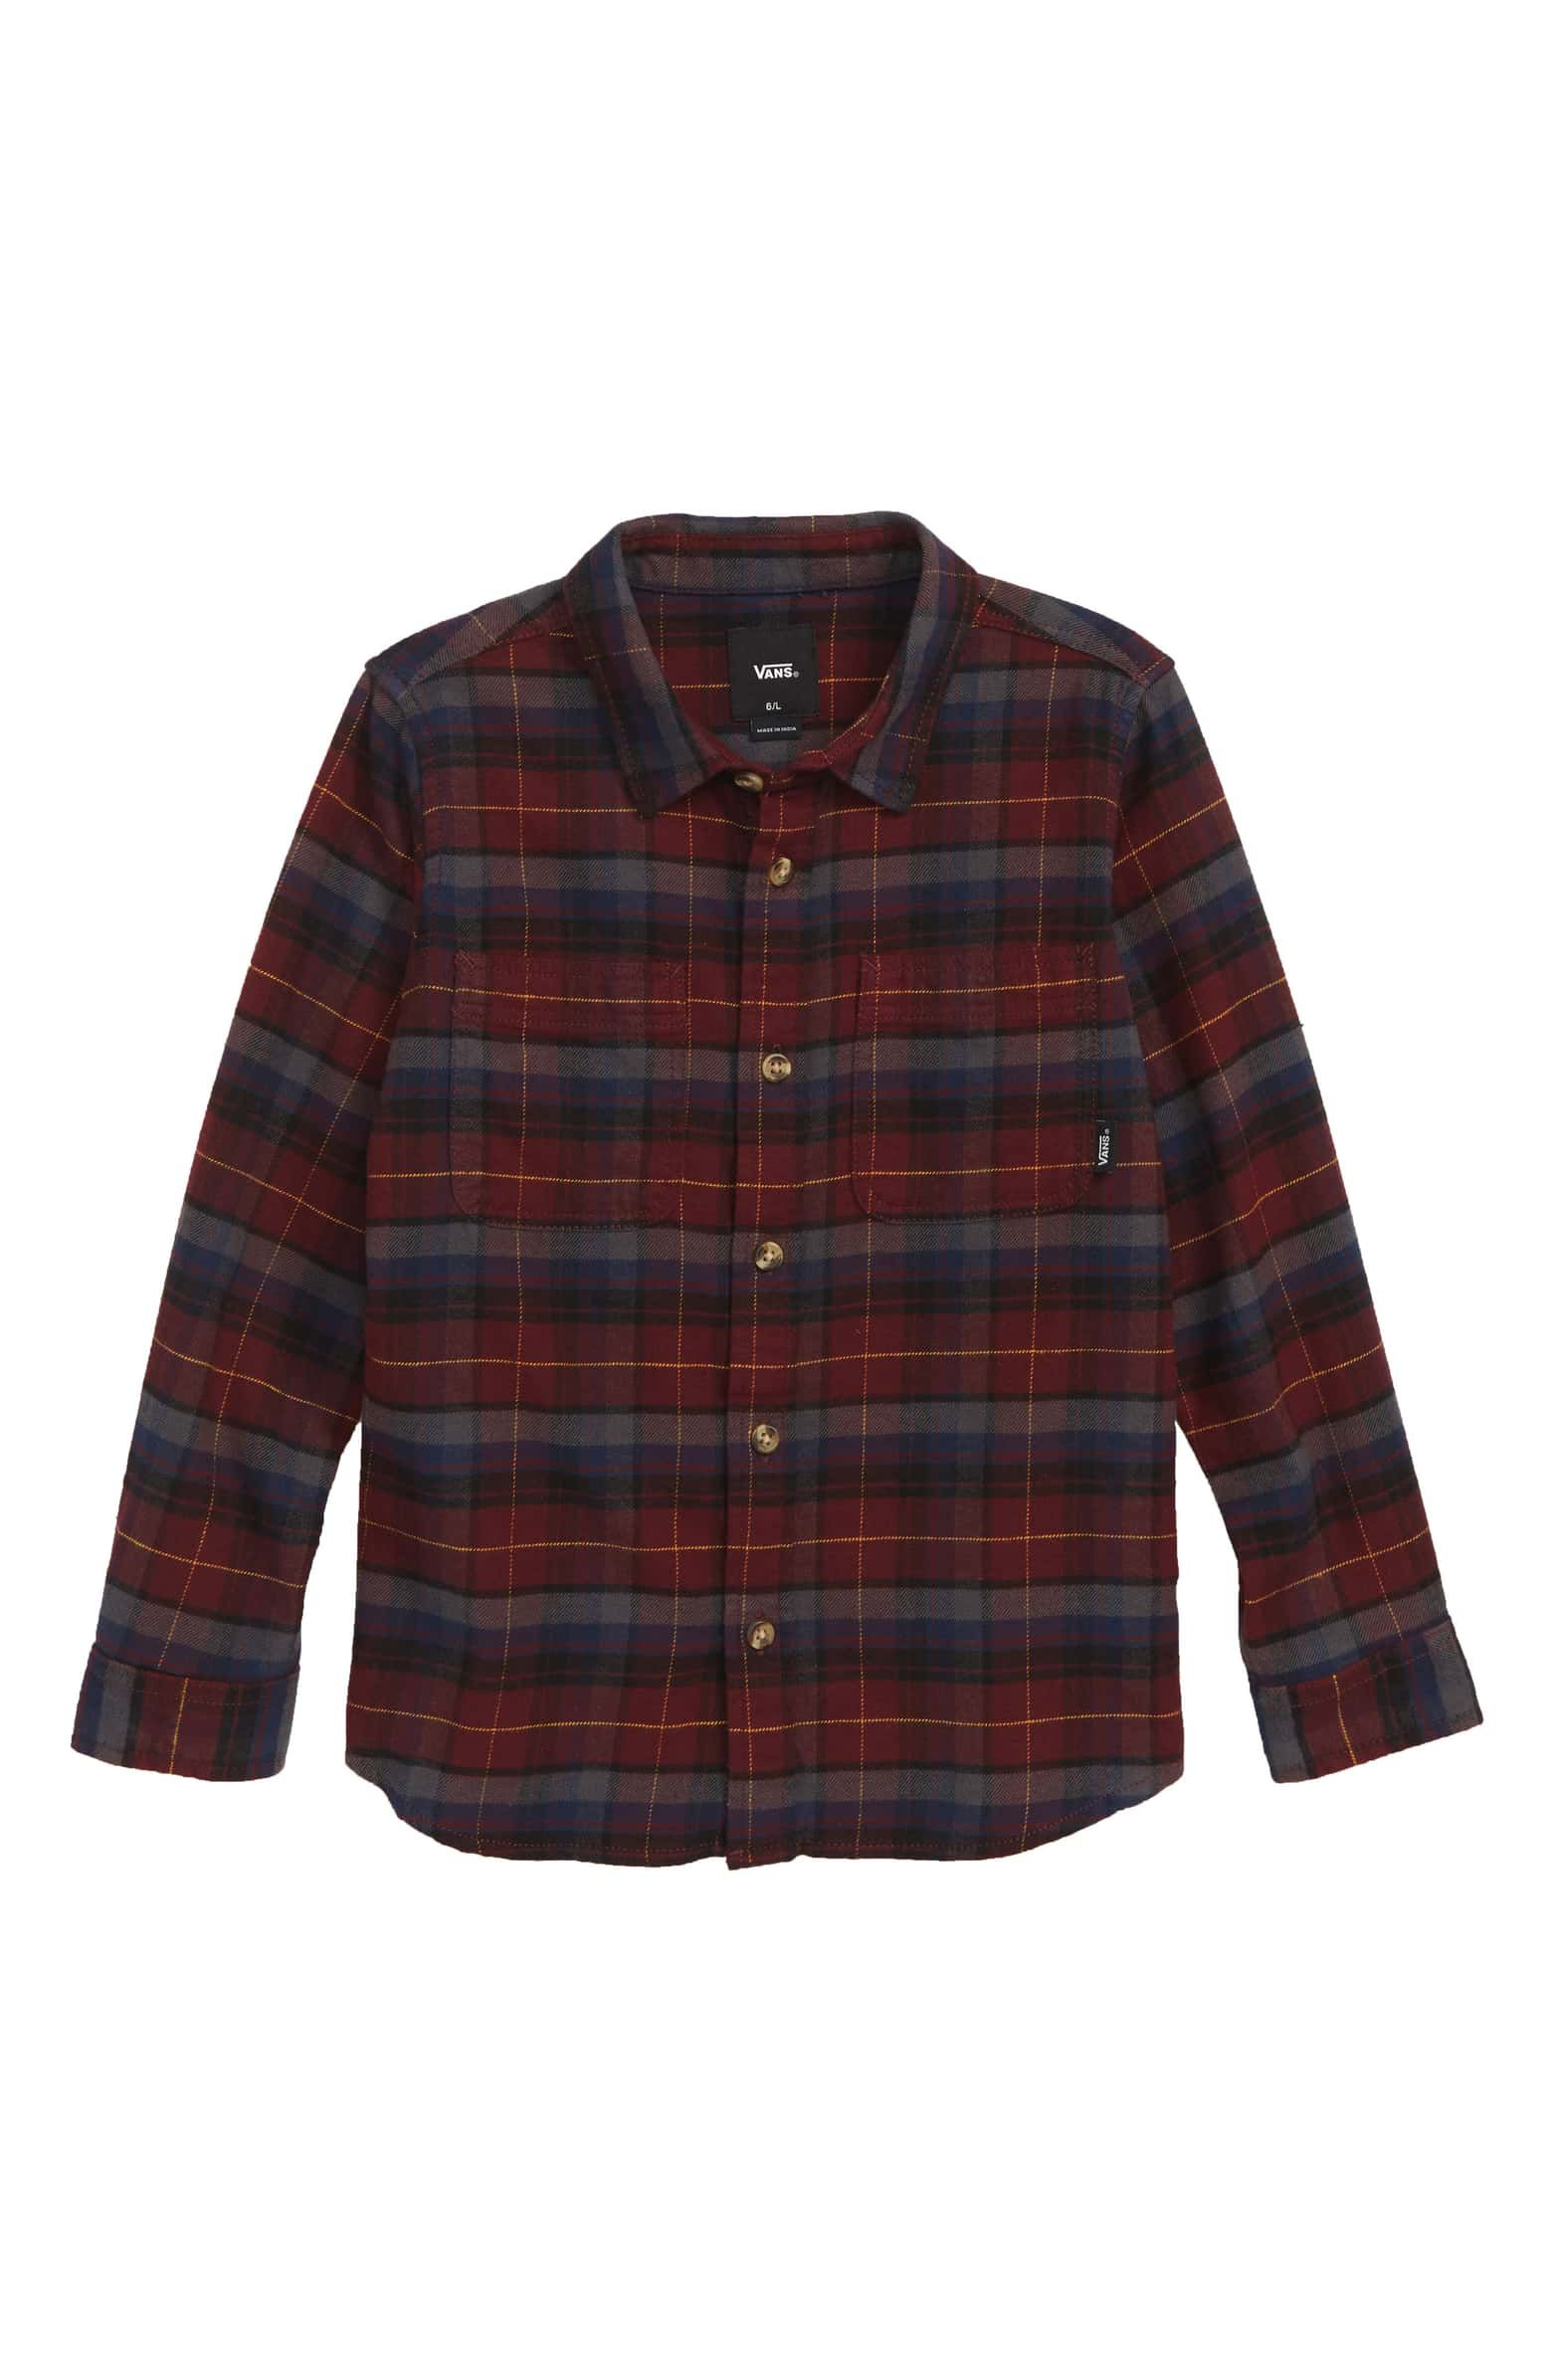 226f3bceef Banfield III Plaid Flannel Shirt